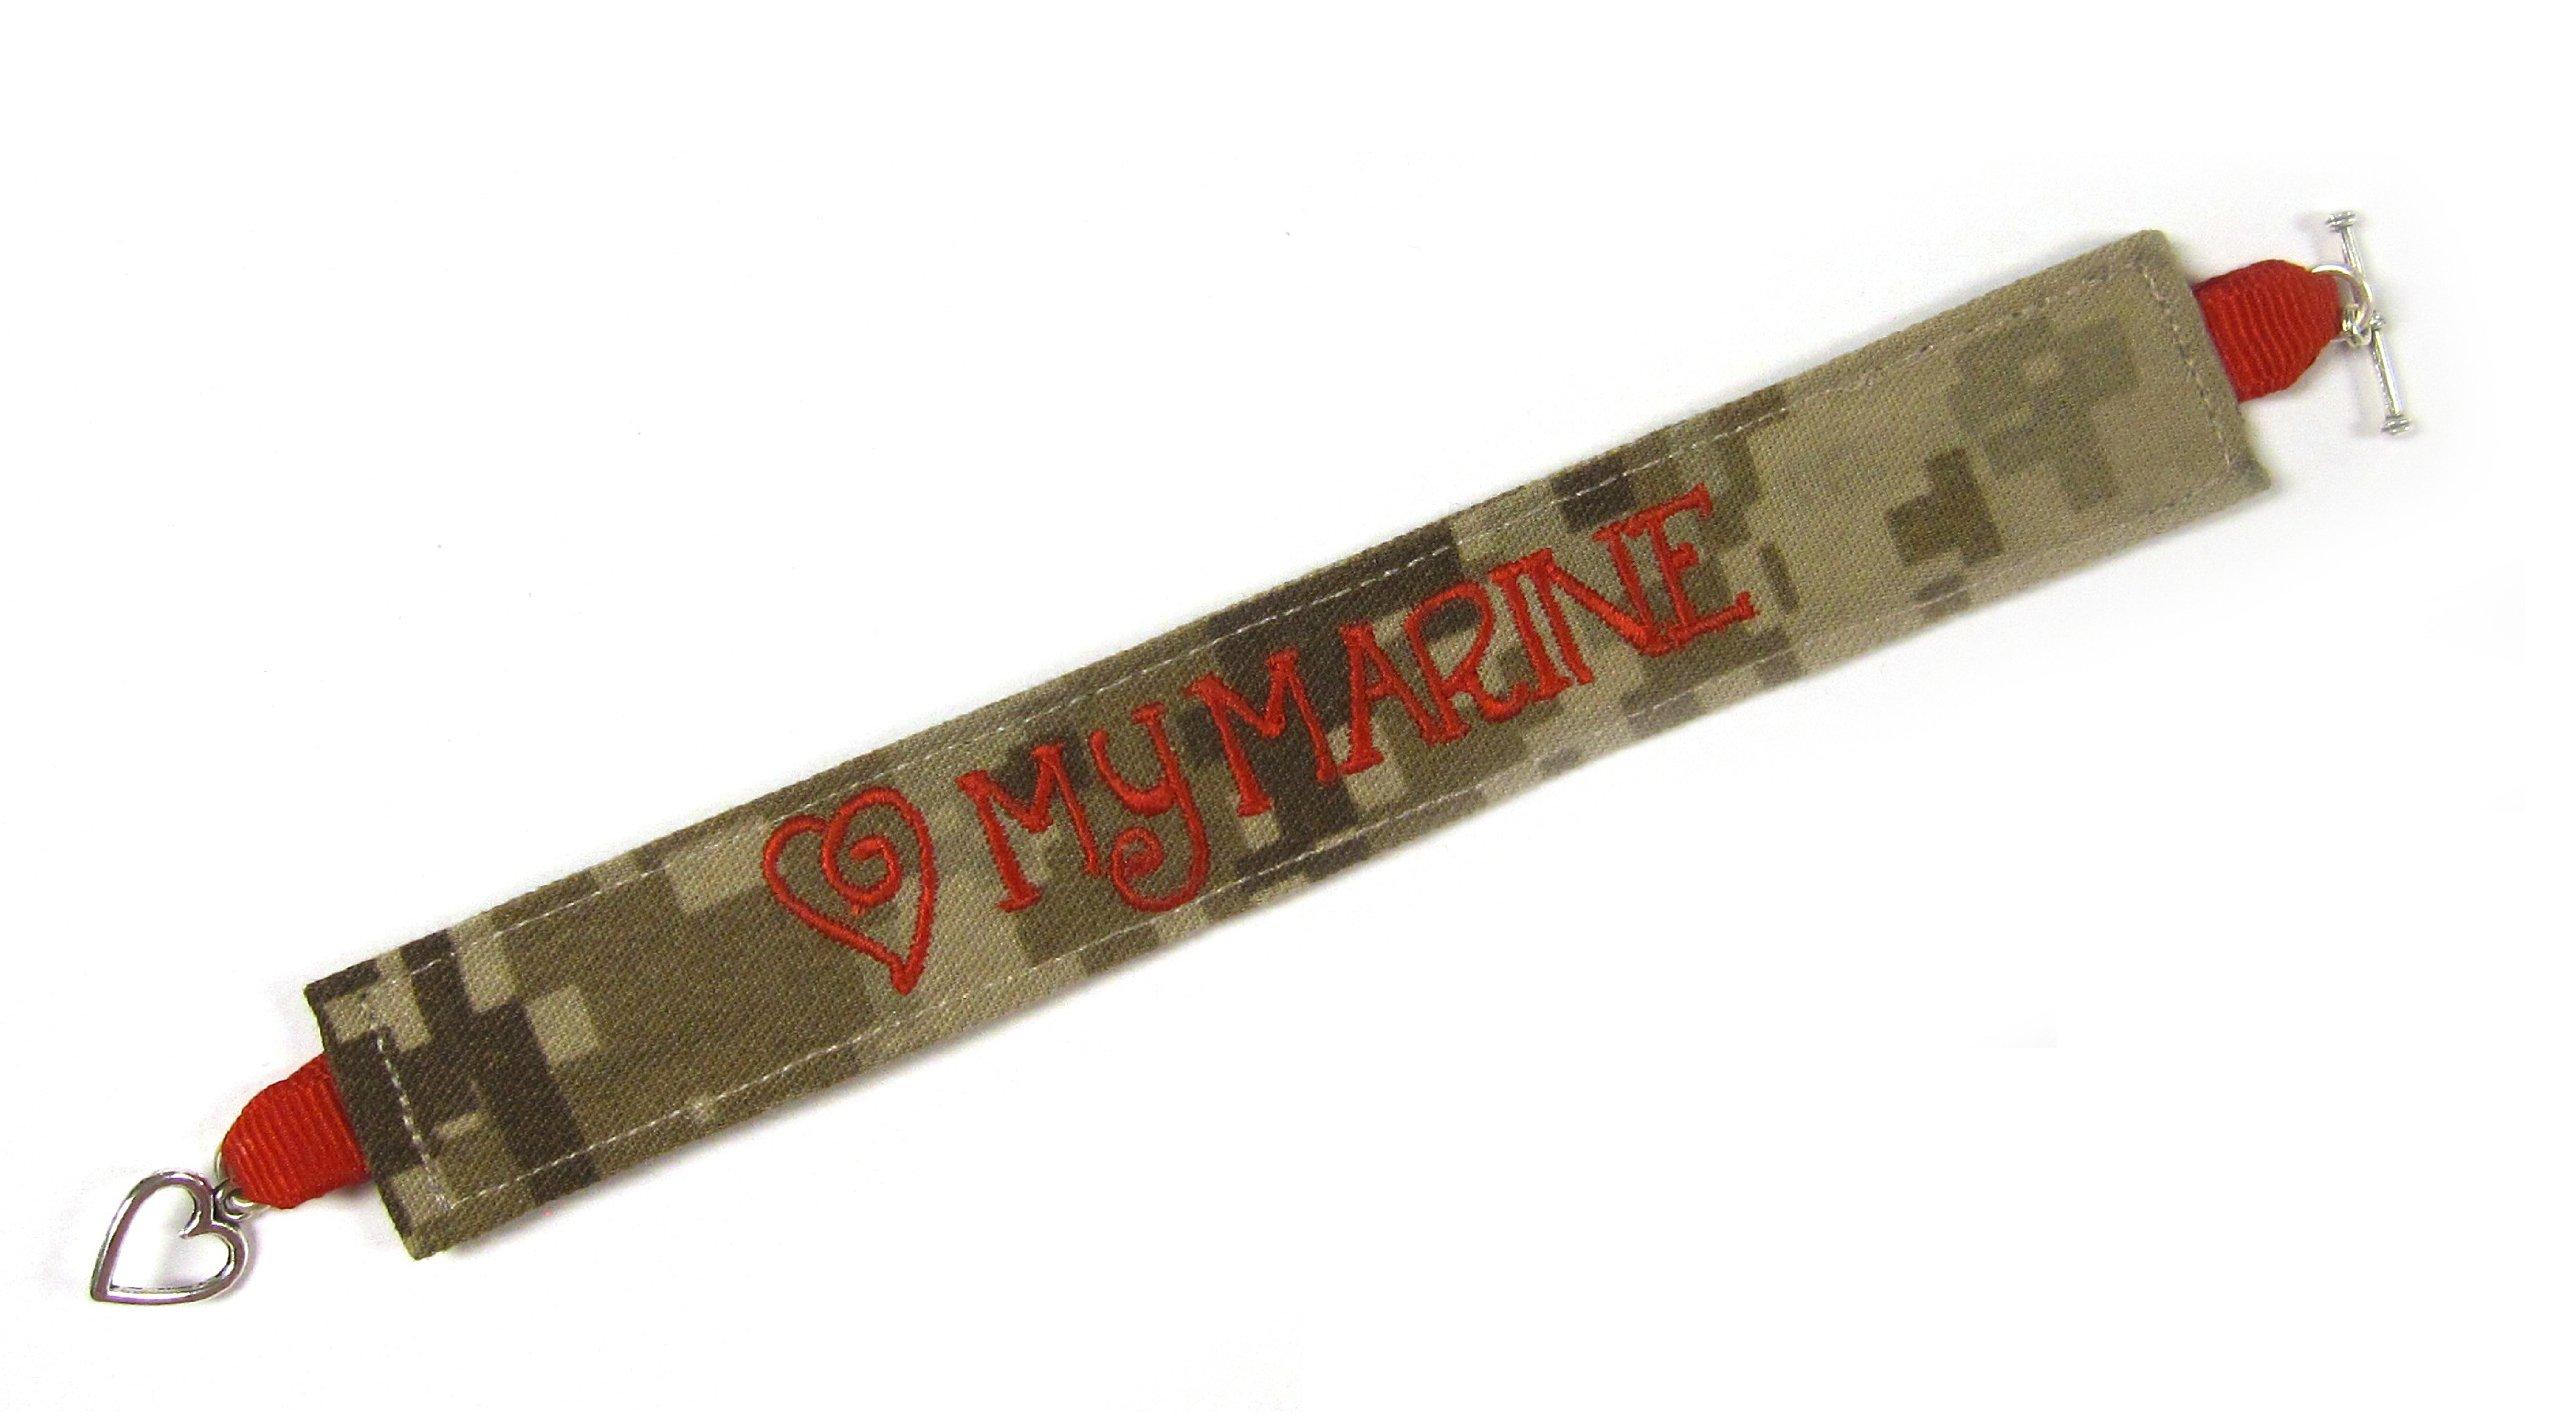 U.S. Marines Name Tape Military Bracelet, Marine Corps Camo Bracelet, USMC Jewelry,U.S. Marines Gifts